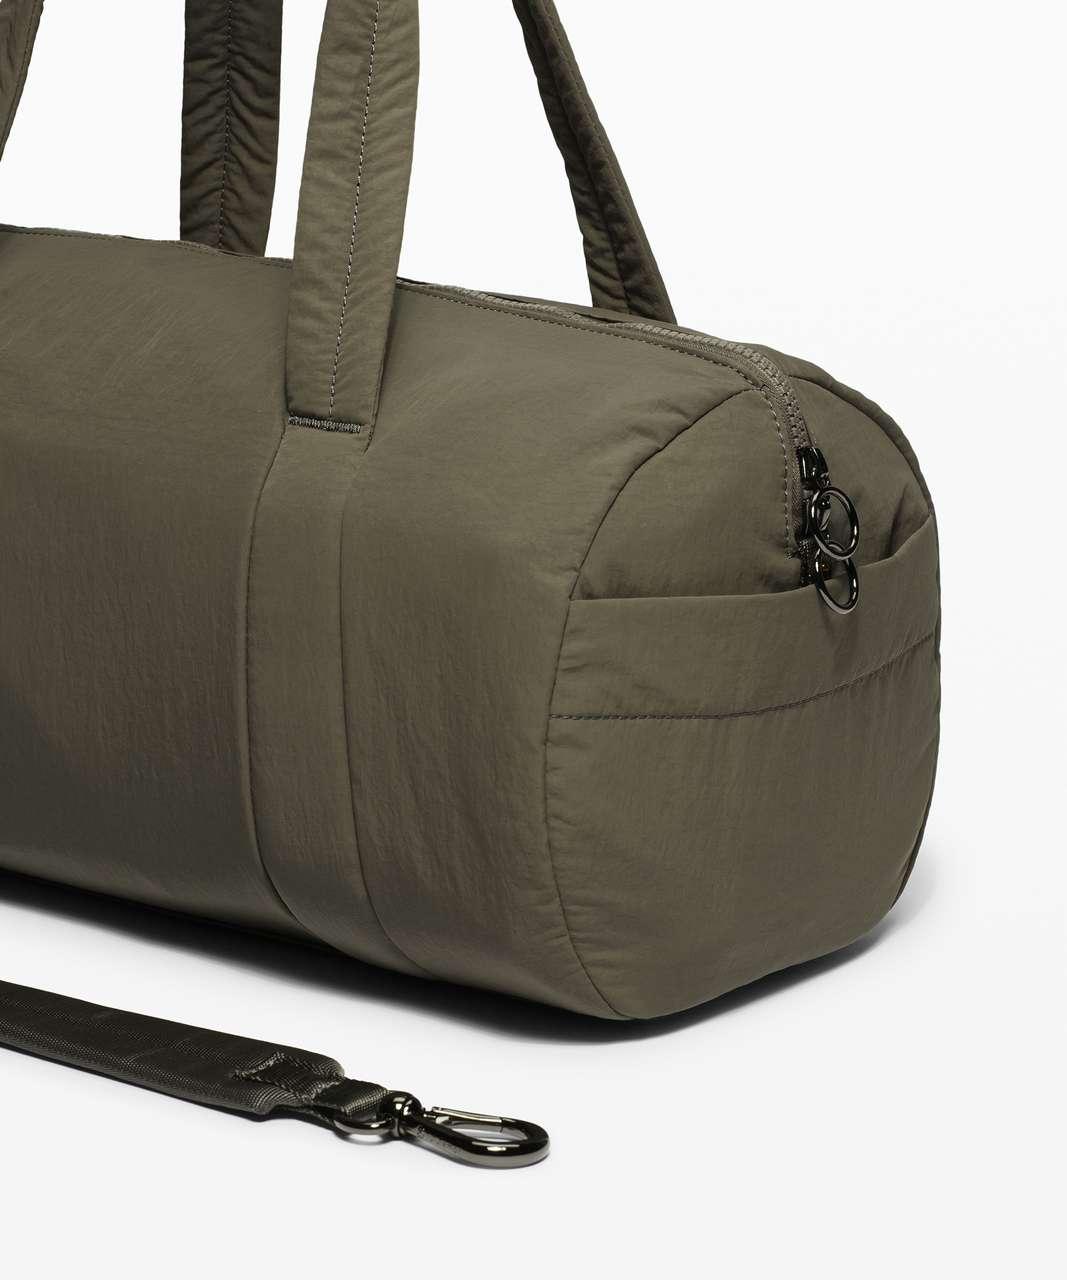 Lululemon On My Level Barrel Bag *16L - Army Green